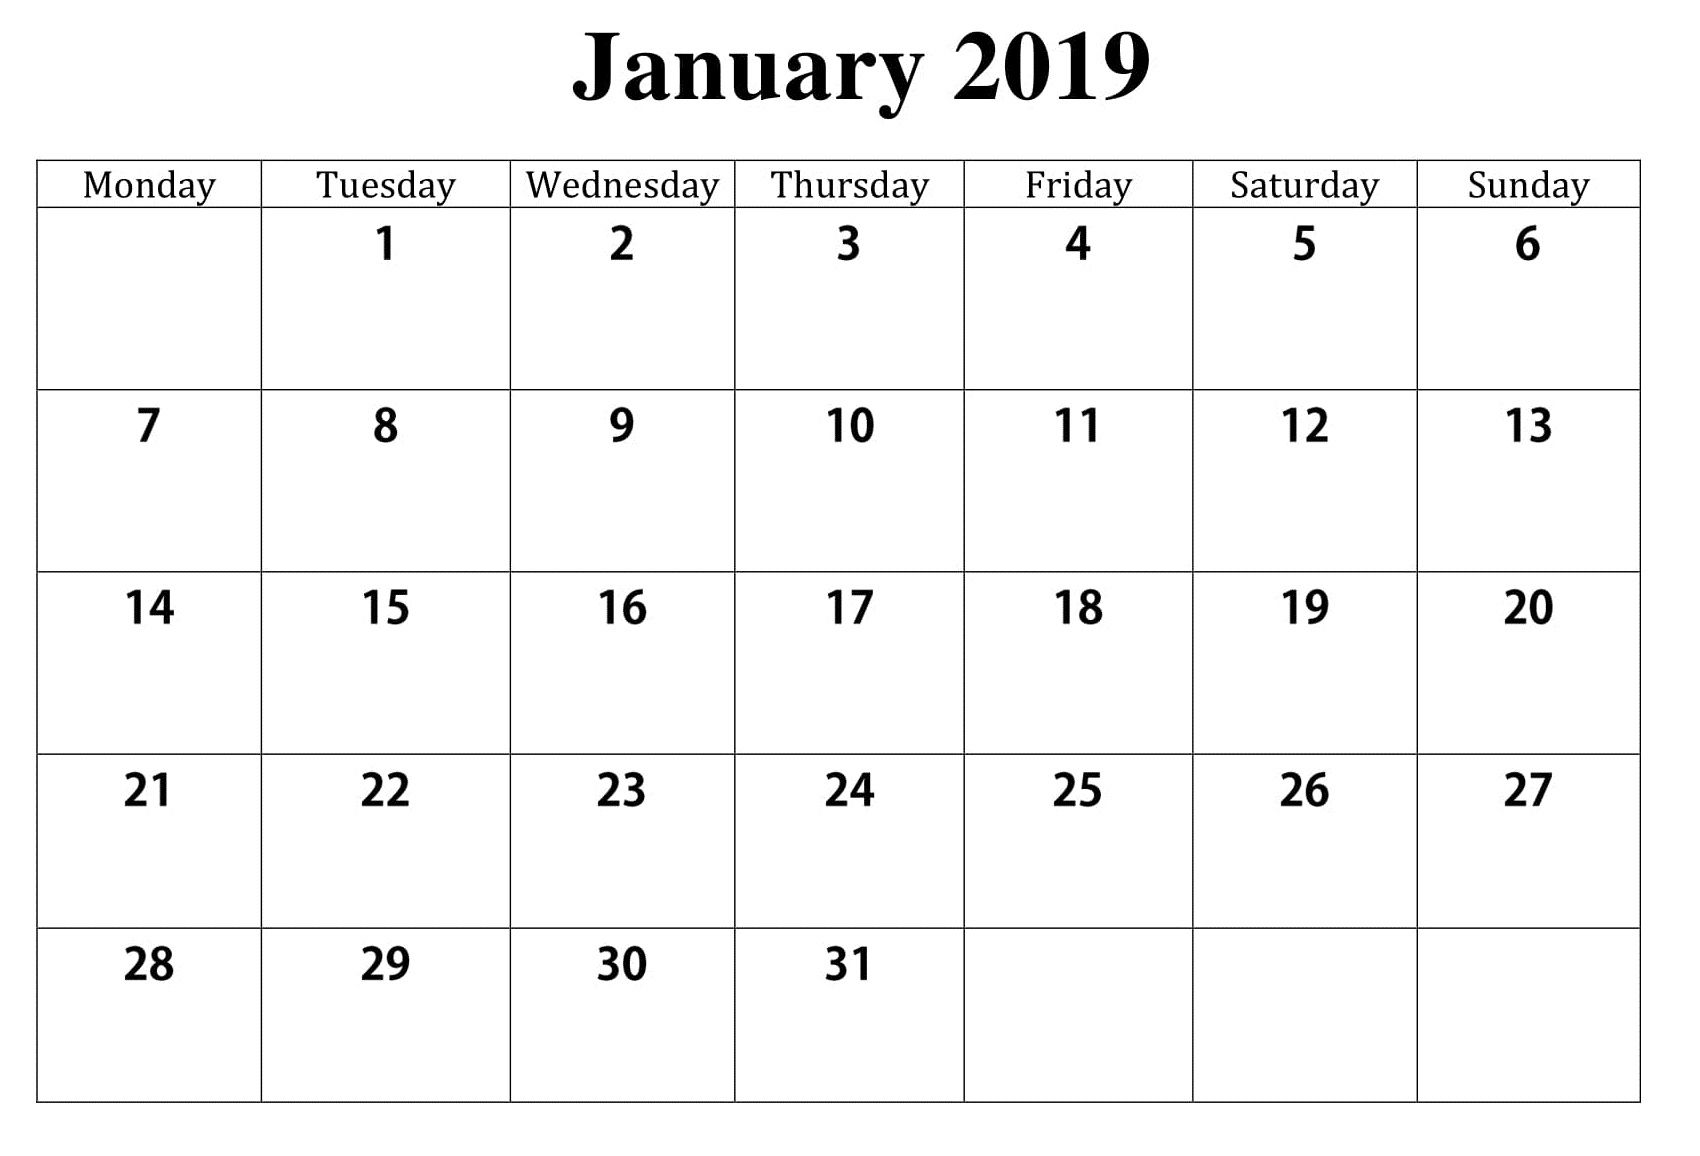 Blank January 2019 Calendar | 2019 calendar, Blank ...